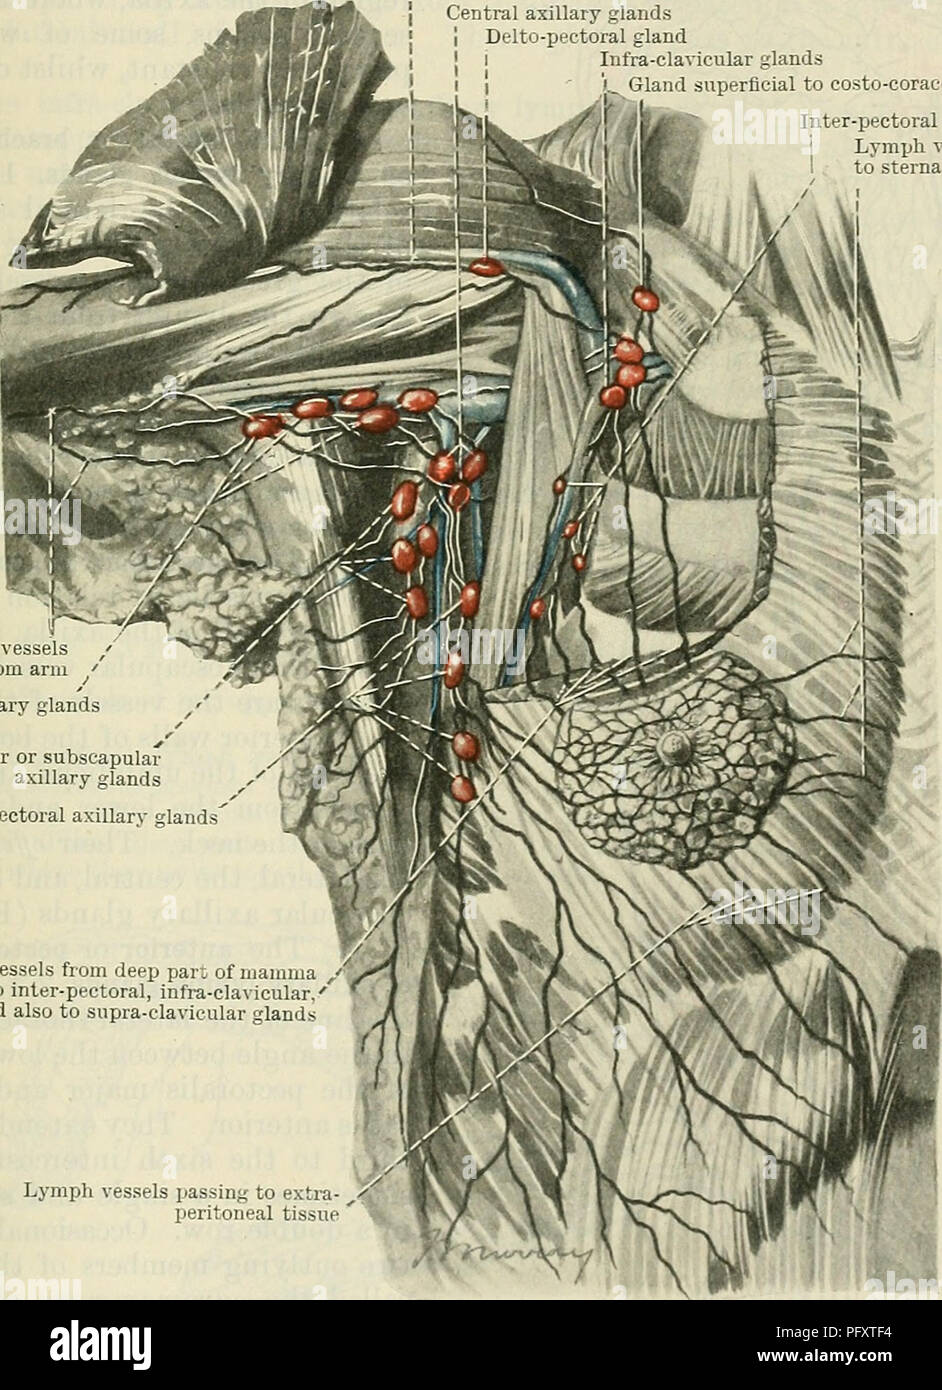 Ulnar Arteries Imágenes De Stock & Ulnar Arteries Fotos De Stock - Alamy